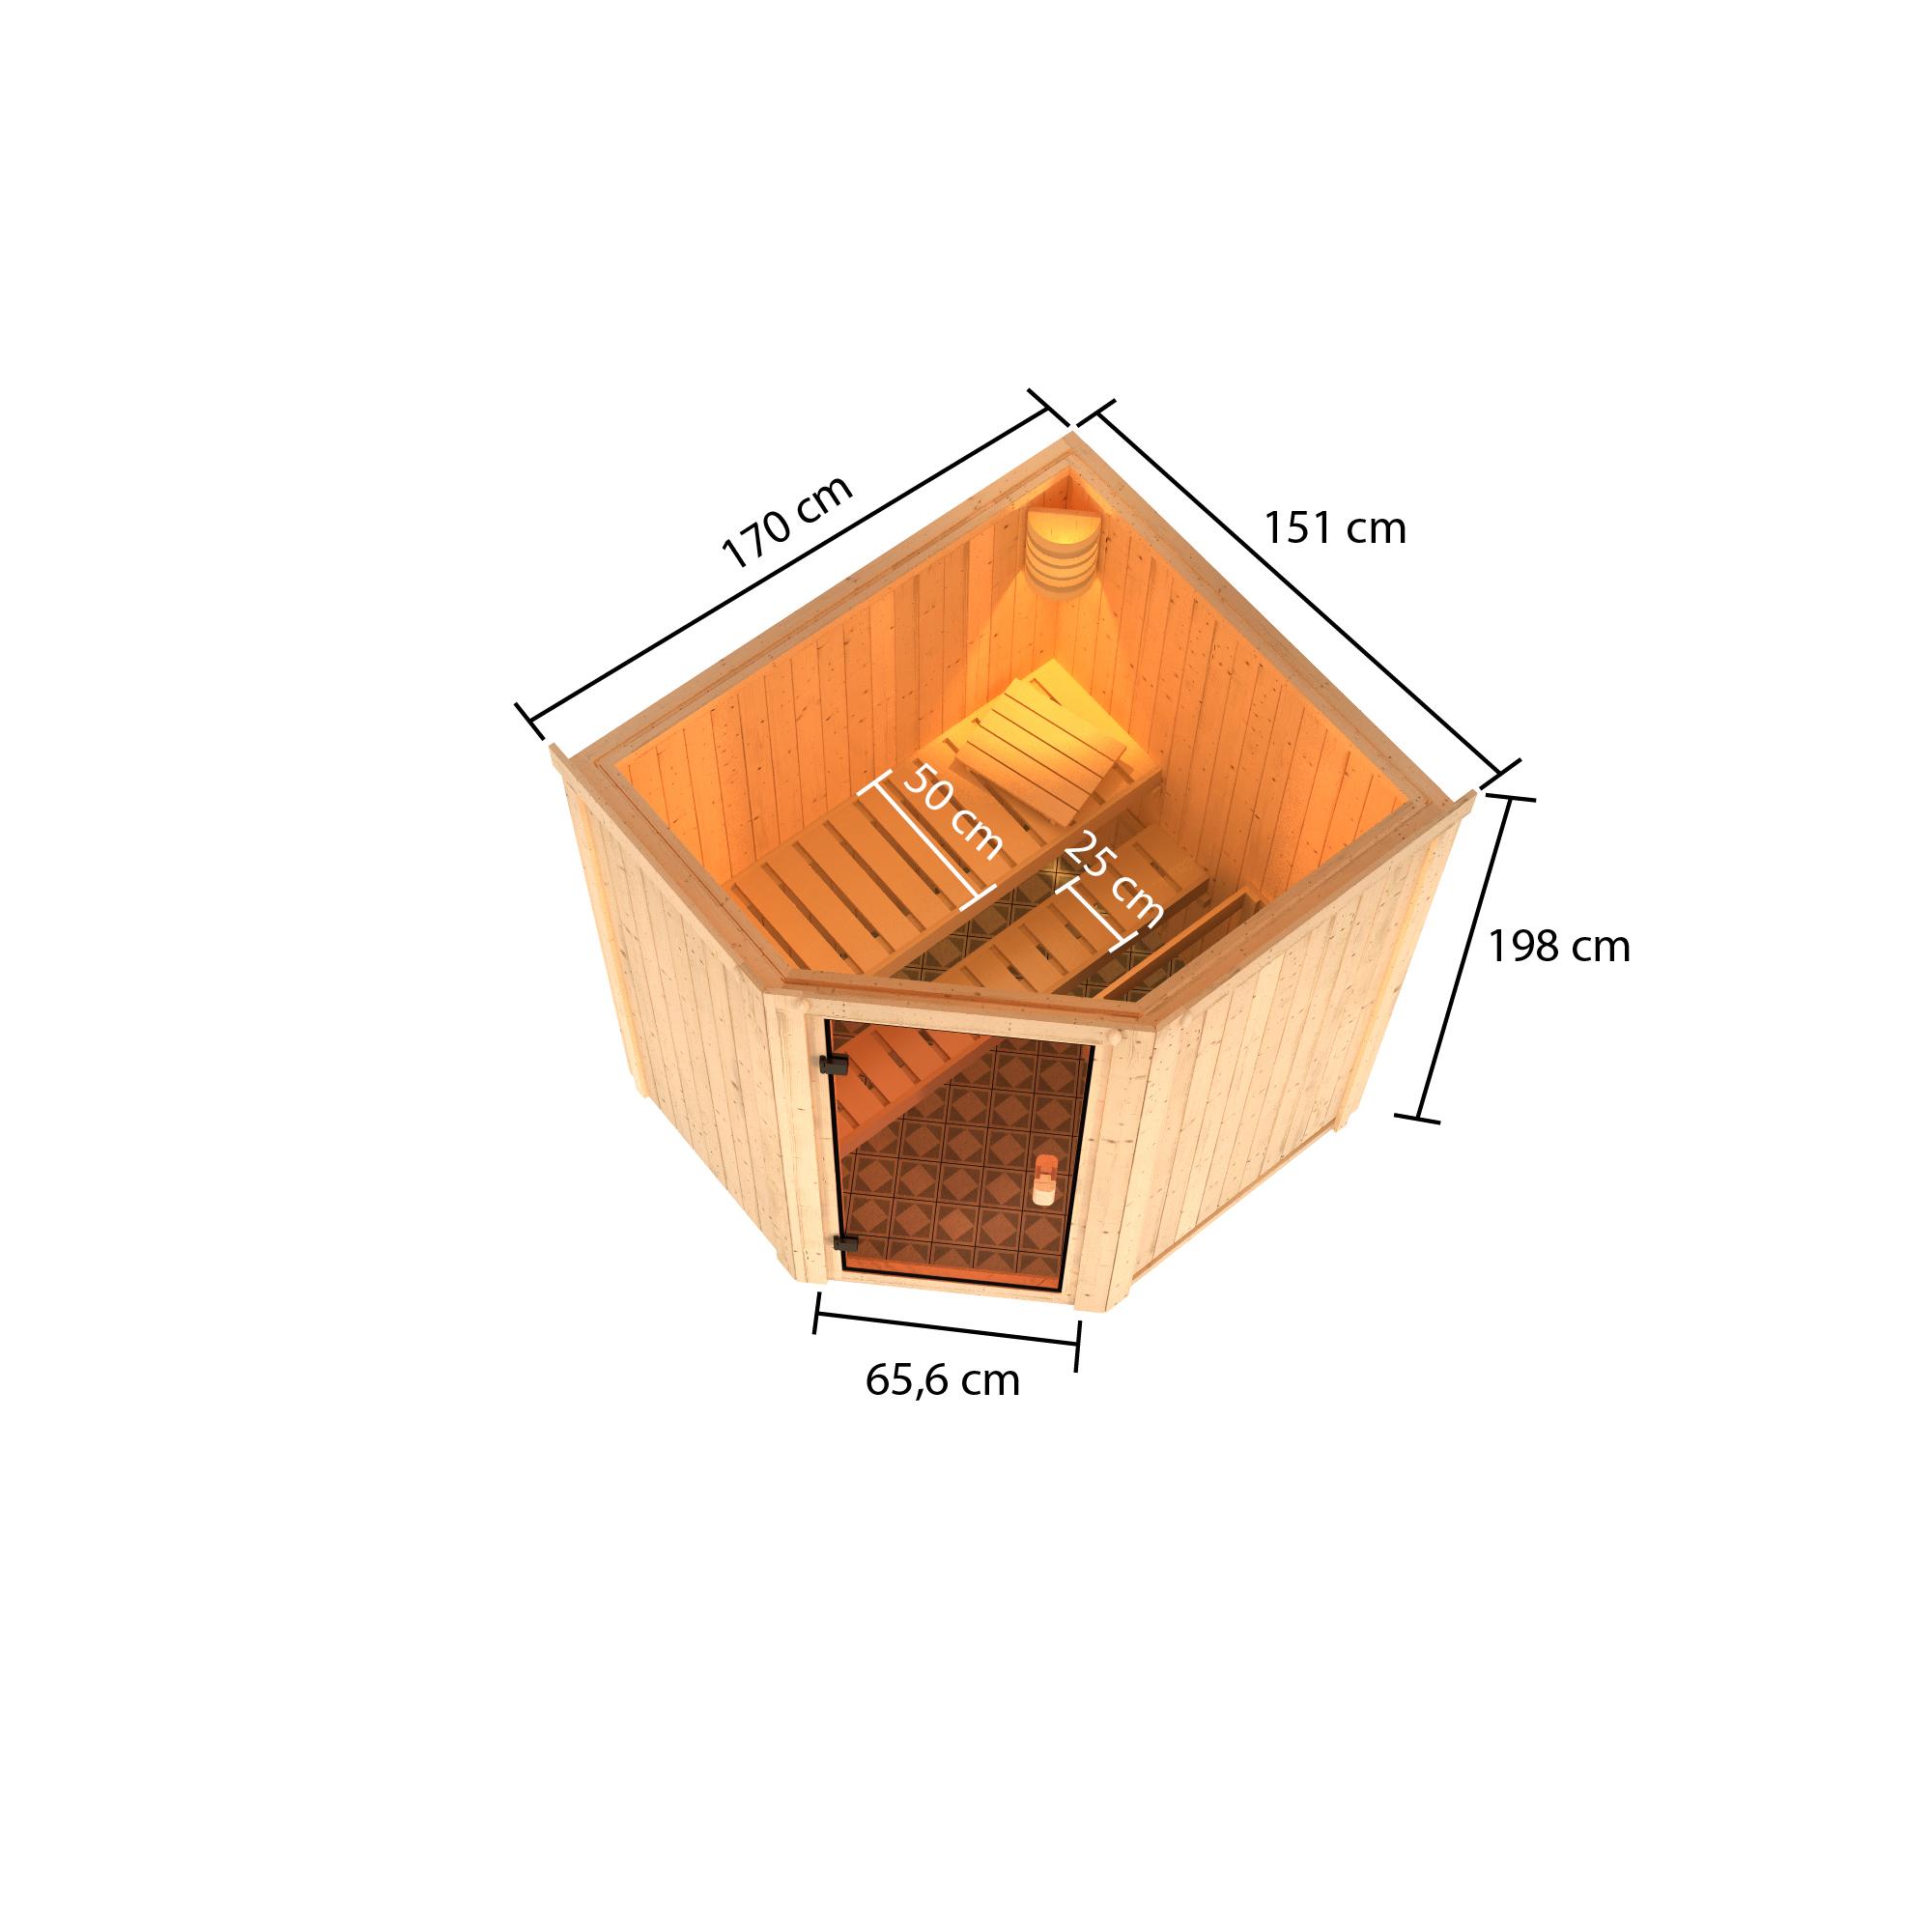 Woodfeeling Sauna Faurin 68mm ohne Saunaofen Bild 4